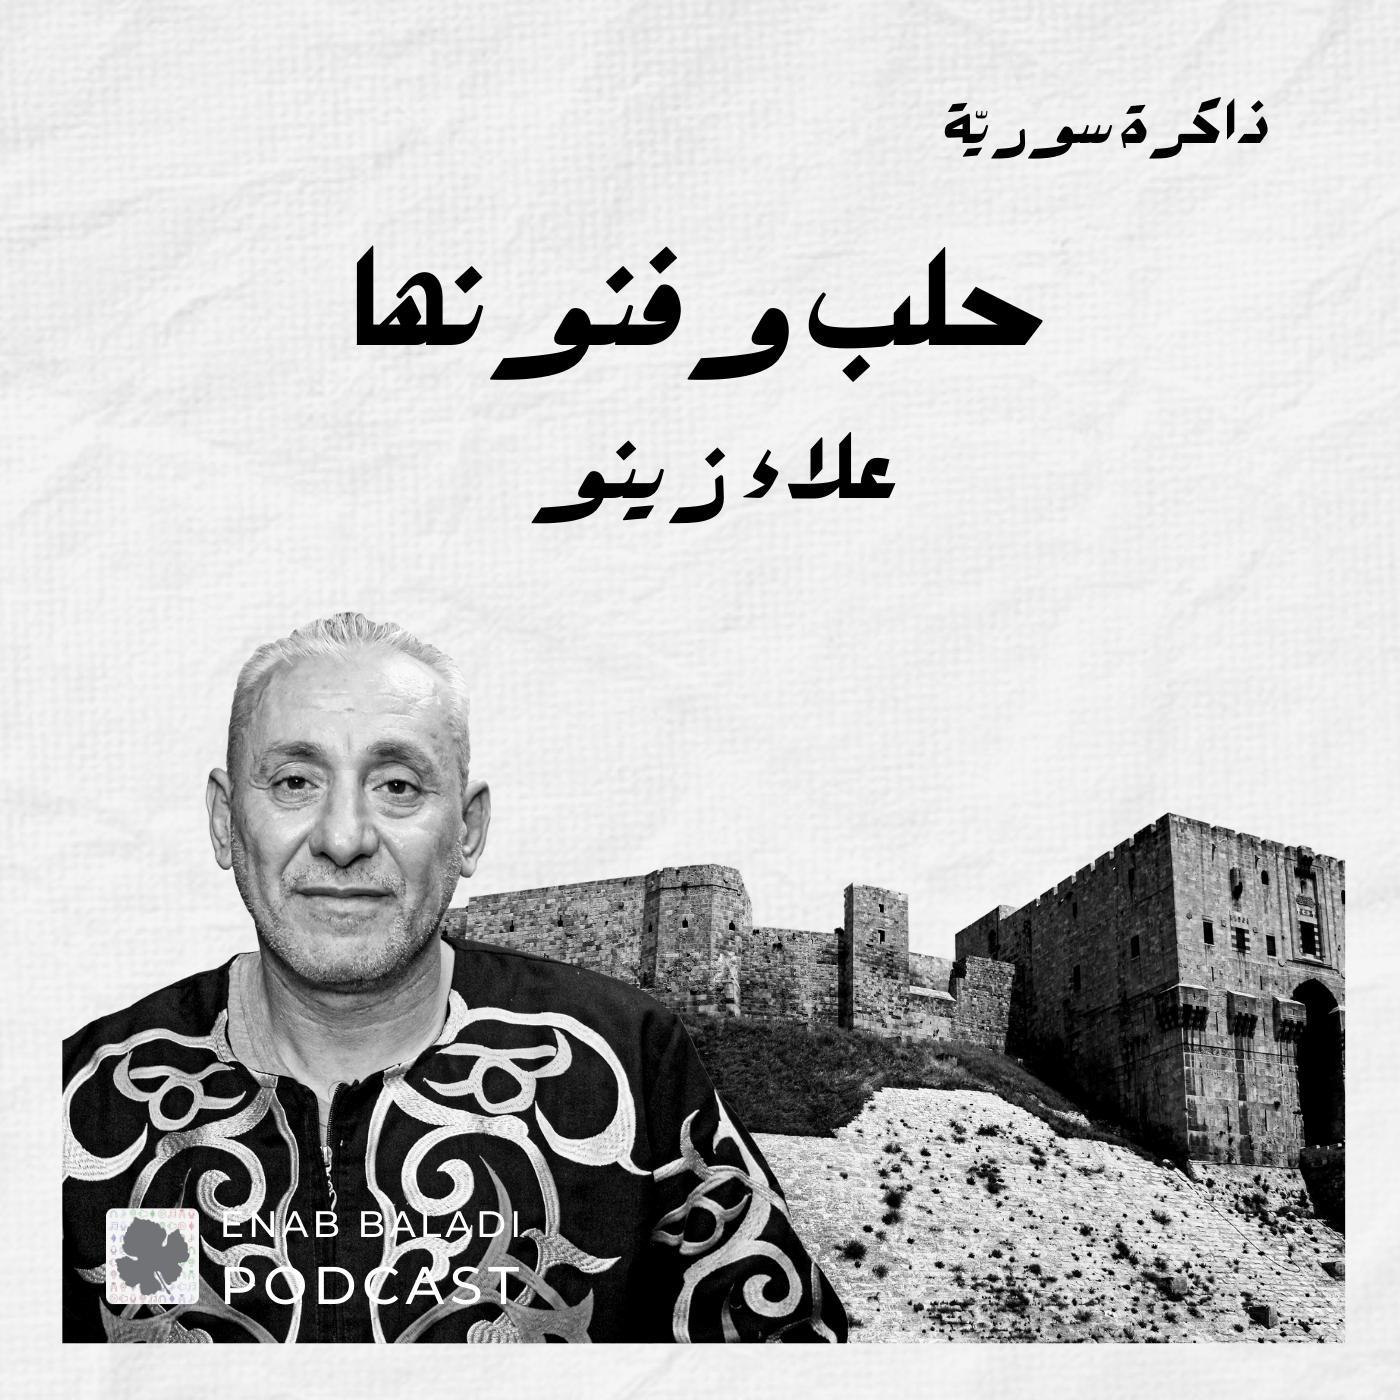 عنب بلدي بودكاست   Enab Baladi Podcast